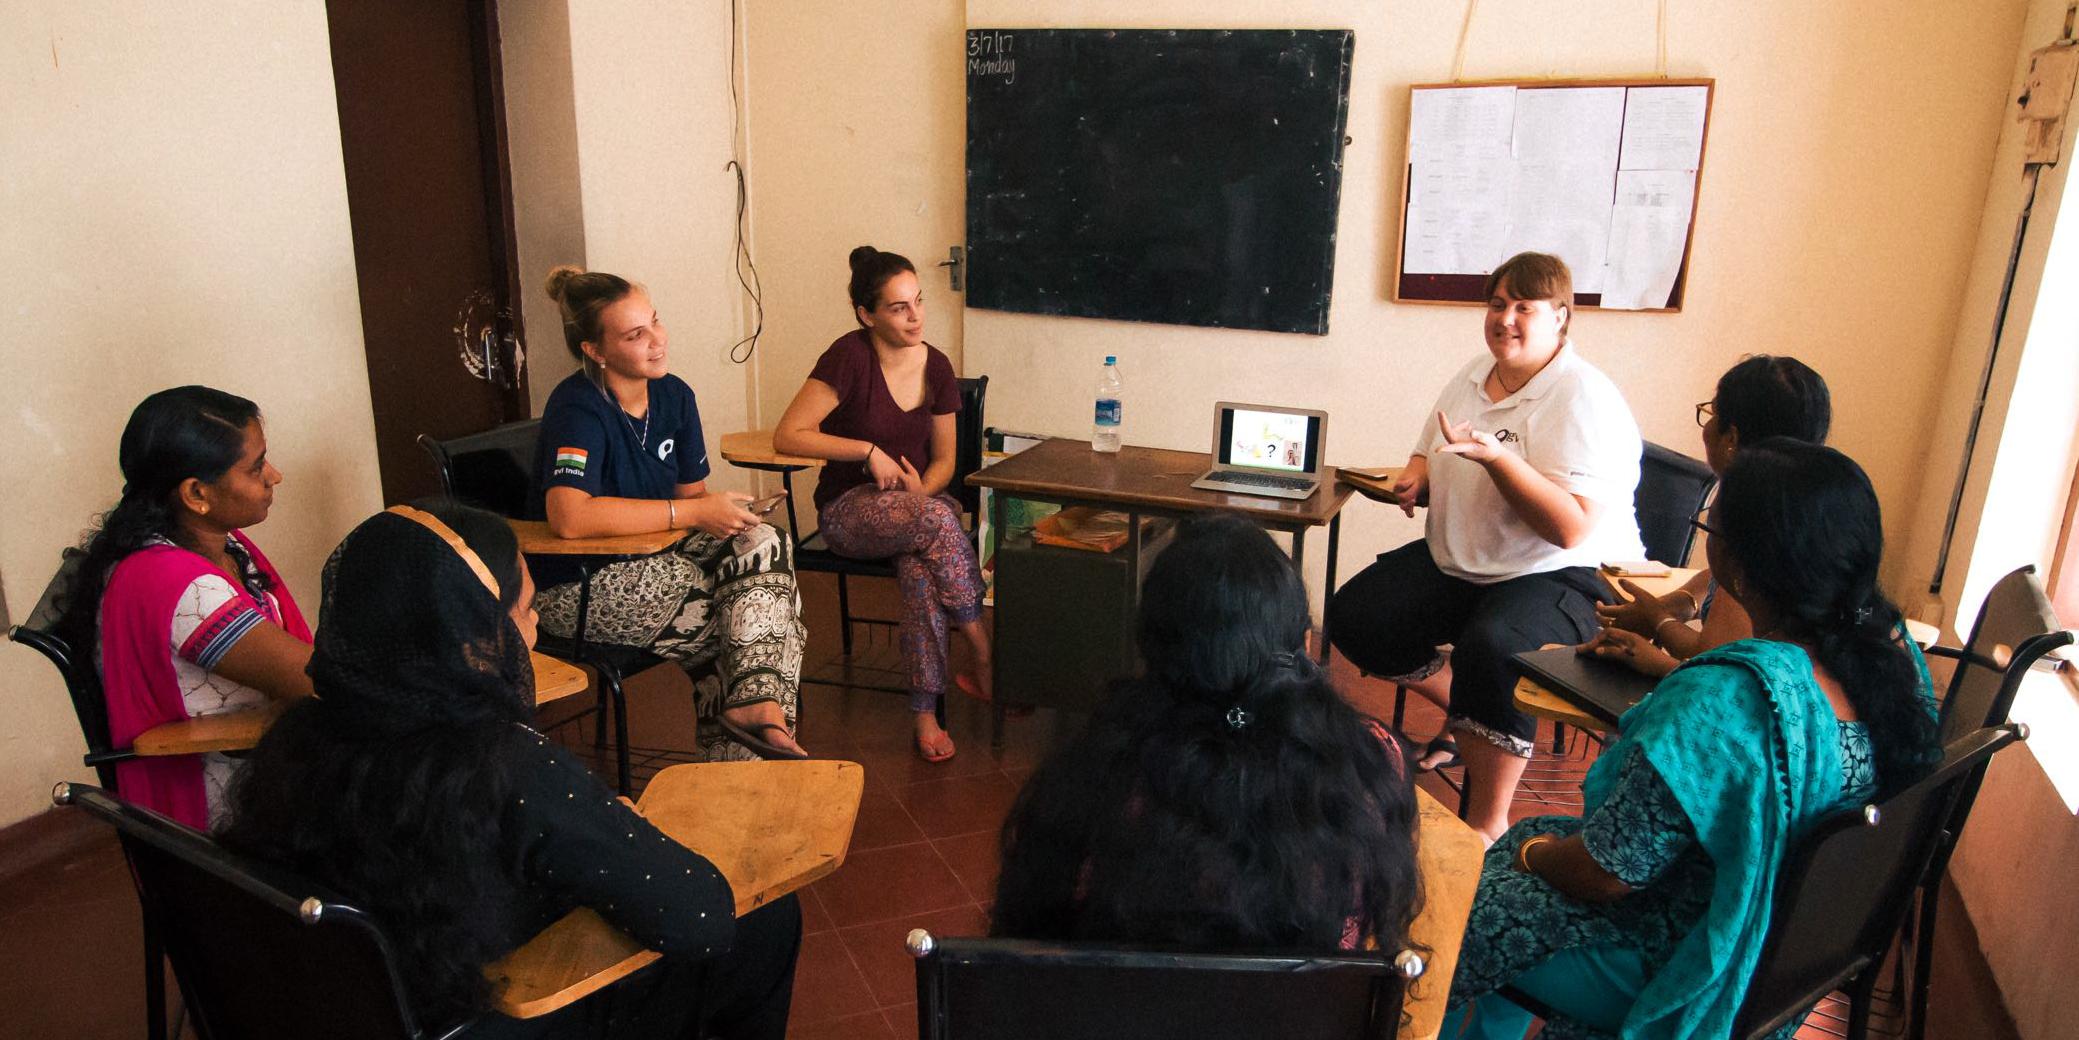 A GVI staff member leads a women's empowerment workshop in Kerala, India.